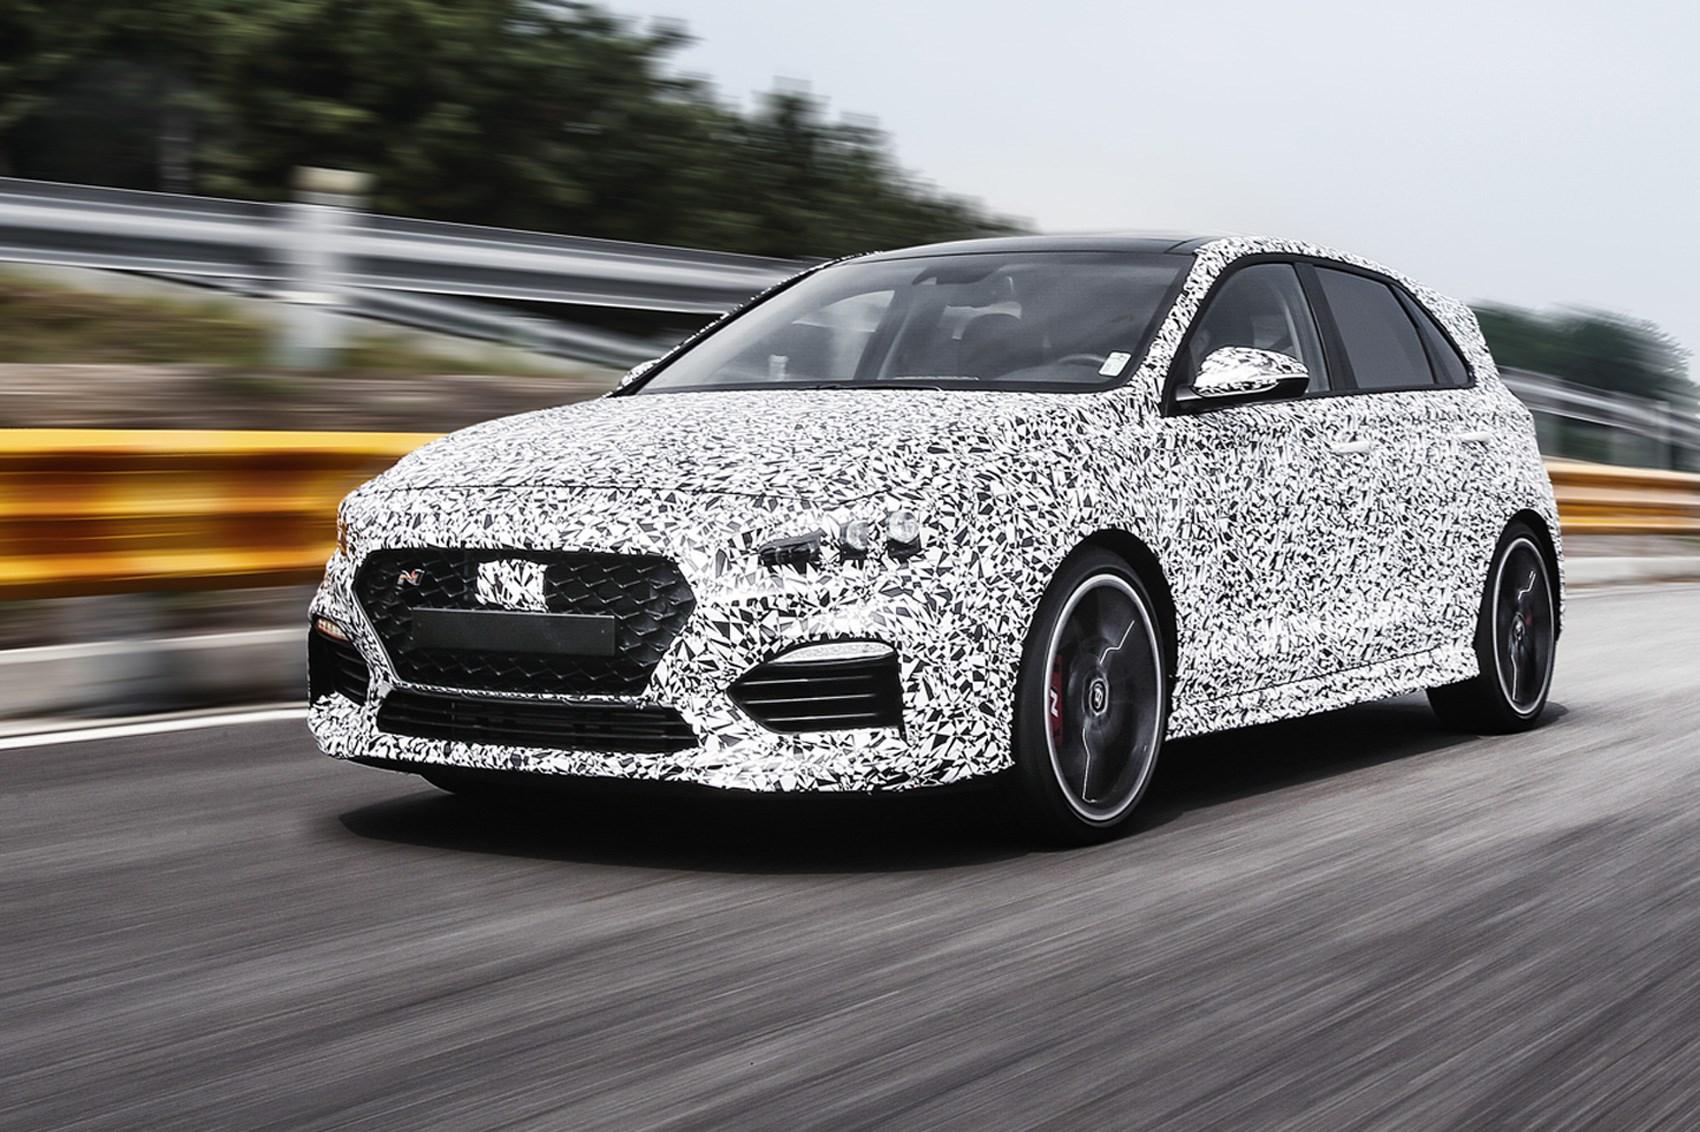 Bmw Of Murray >> Hyundai i30 N prototype (2017) review | CAR Magazine